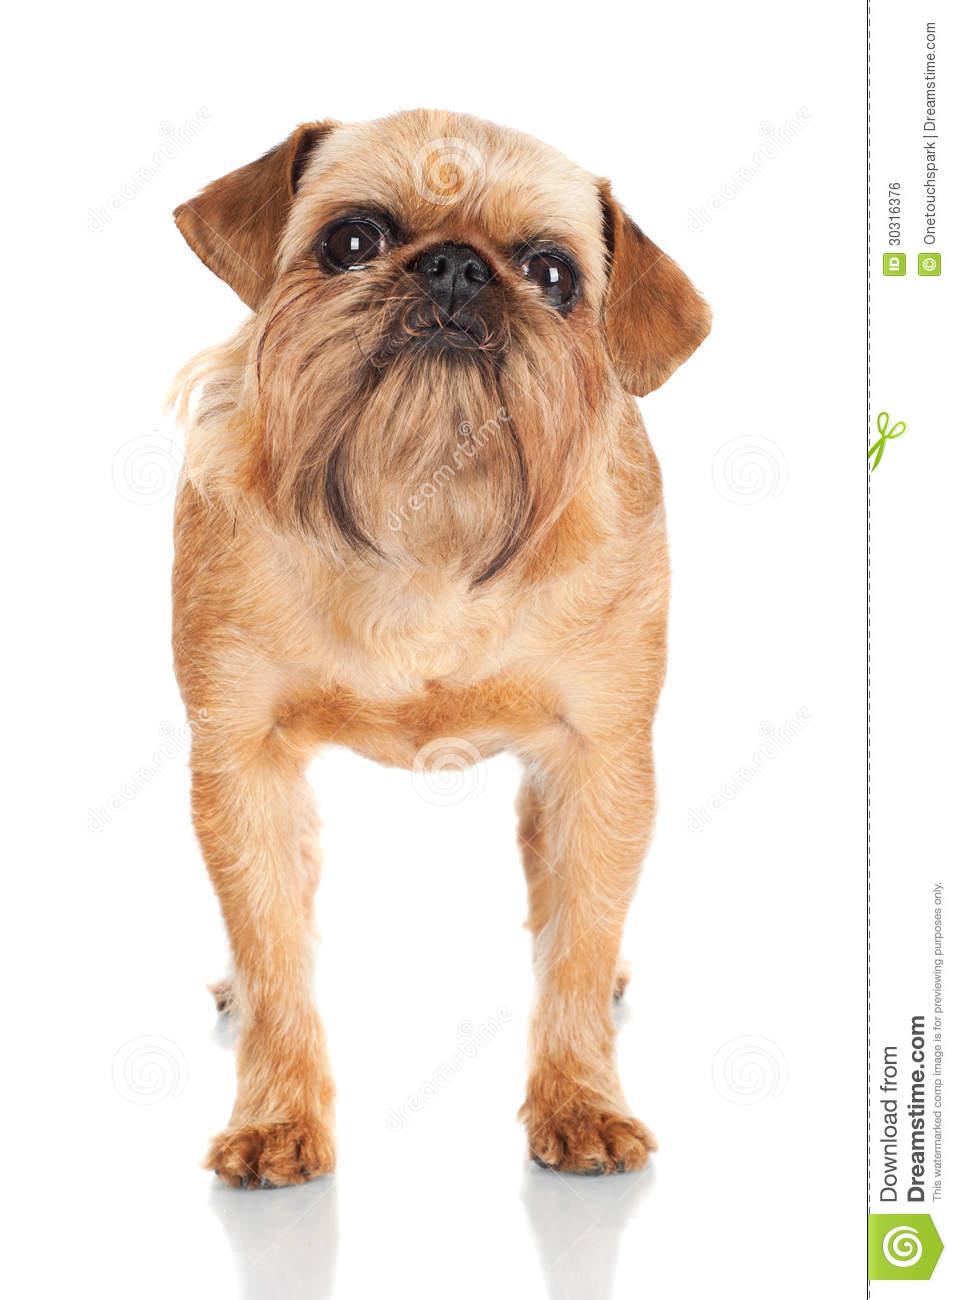 Brussels Griffon Dog Portrait Royalty Free Stock Image.